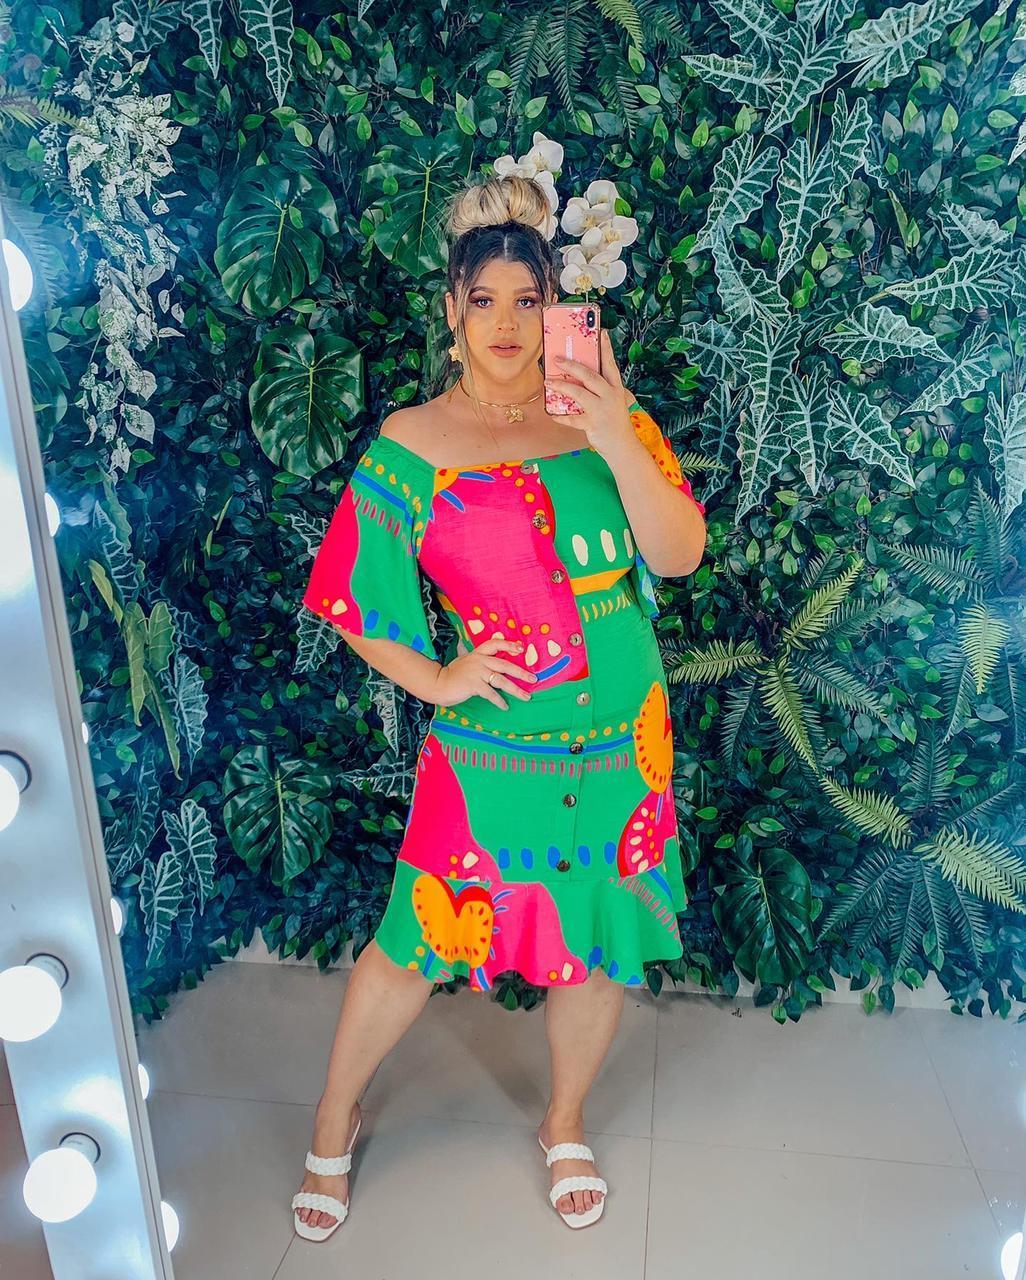 Vestido PLUS- MADAME MINEIRA